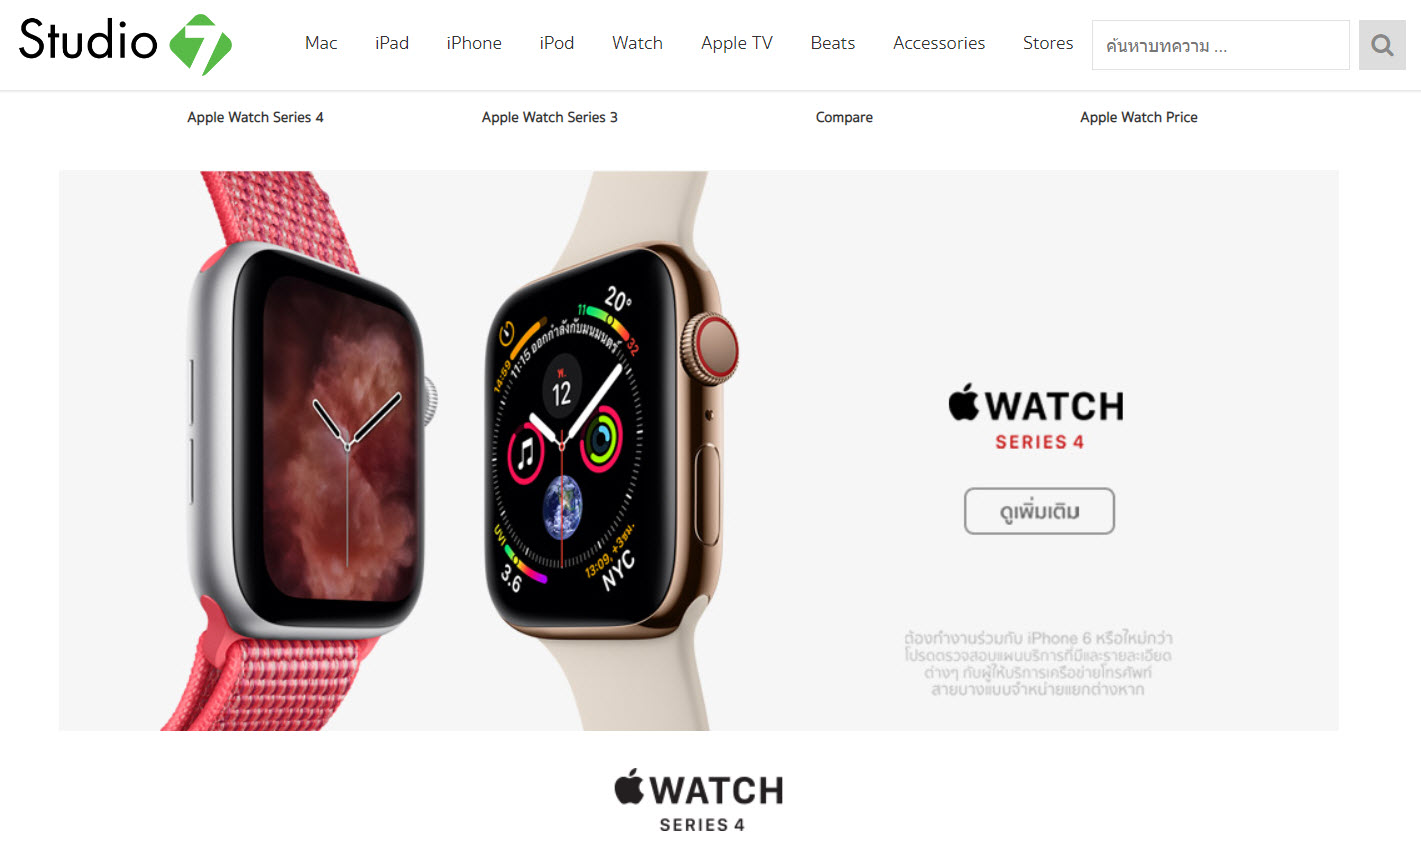 Studio7 Apple Watch